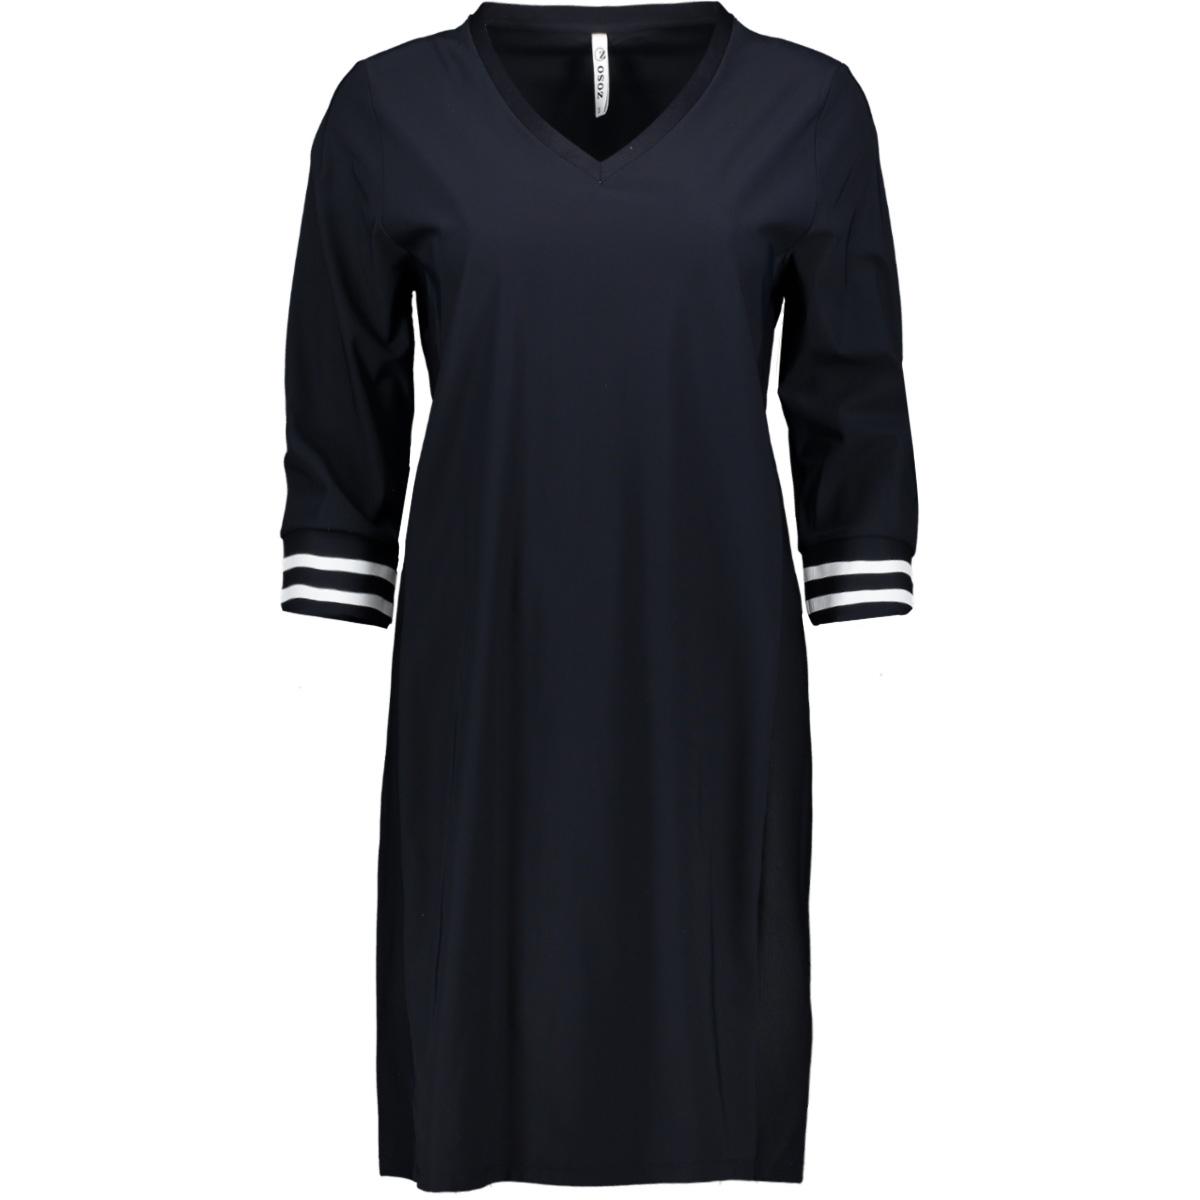 belle travel tunic with rib 192 zoso jurk navy